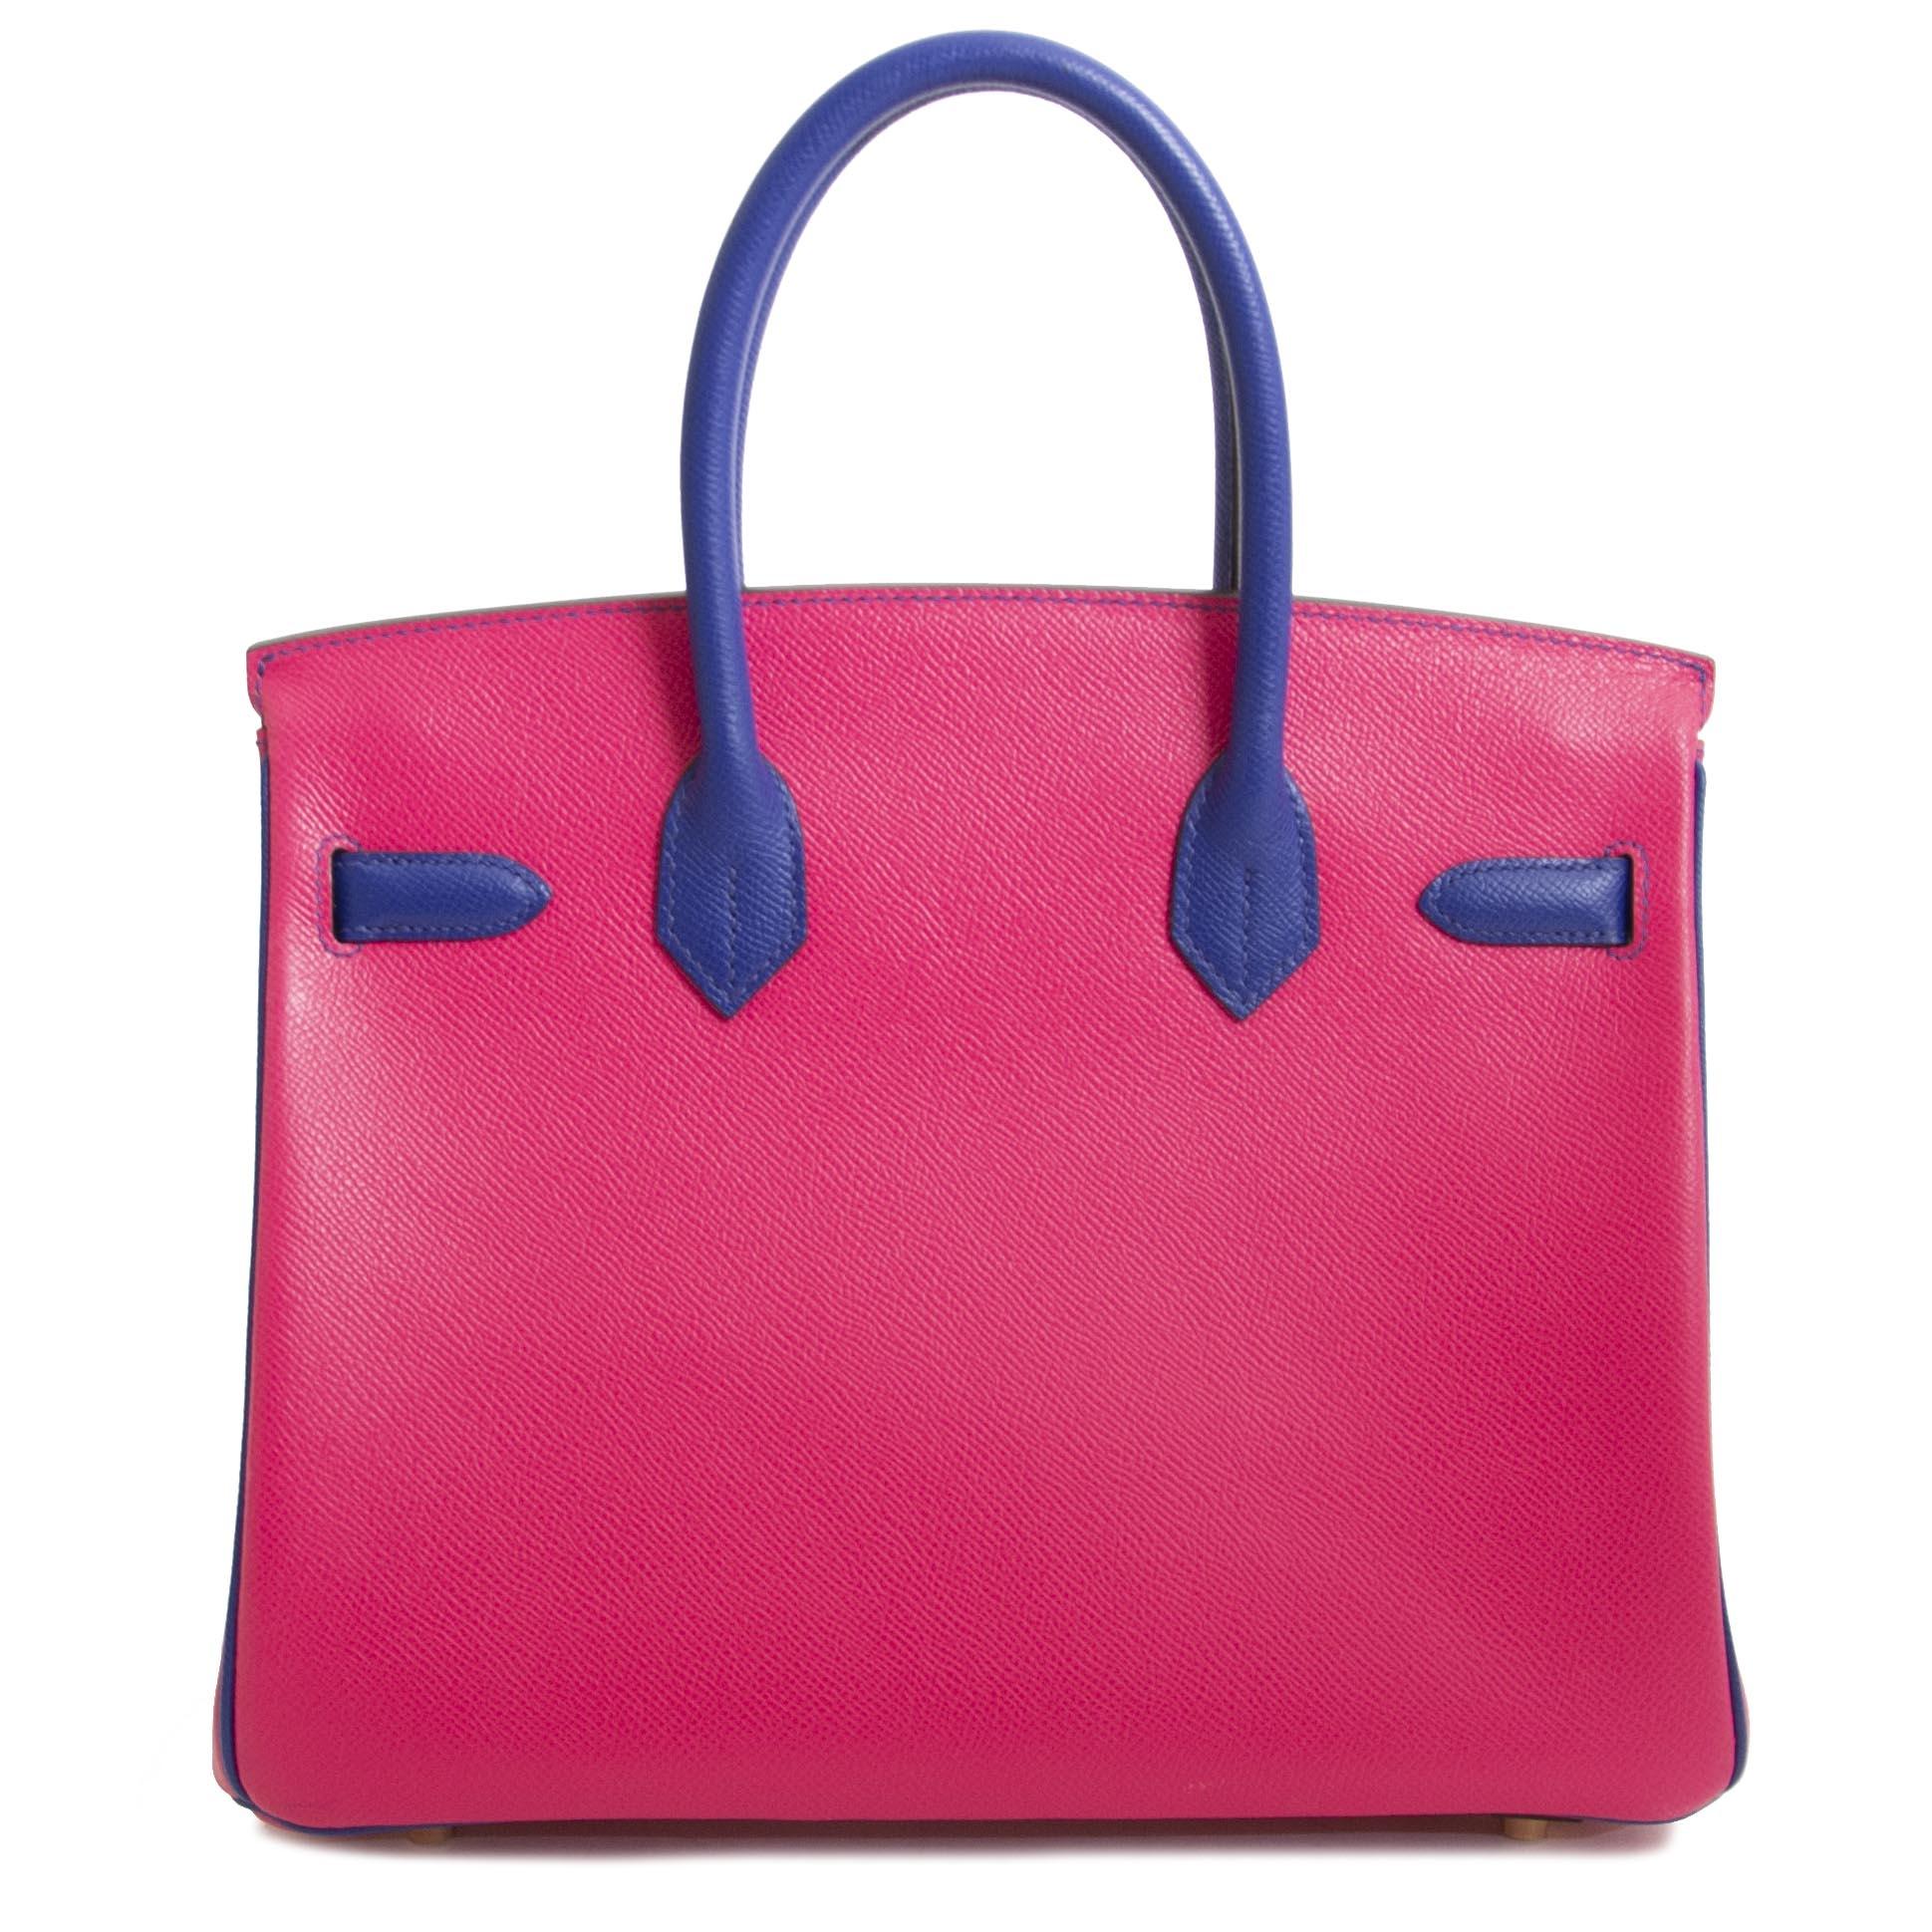 Hermès Birkin 30 Epsom HSS Horseshoe GHW Rose Tyrien / Bleu Electrique Epsom GHW